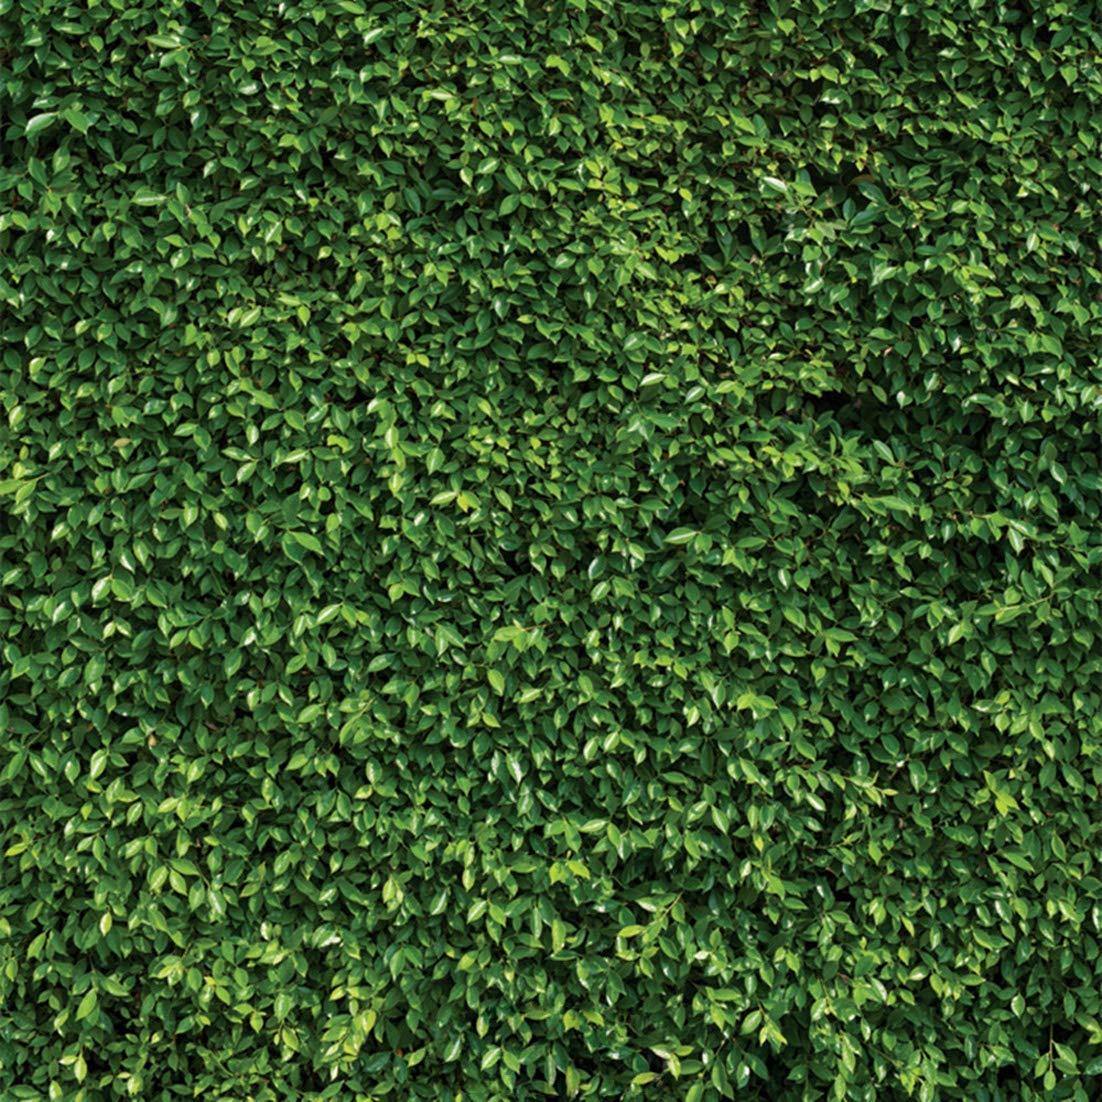 8x8フィート スプリング ナチュラルグリーン 葉 写真 背景 芝生 パーティー 背景 新生児 赤ちゃん 恋人 結婚式 子供 誕生日 バナー 写真スタジオ小道具 RM-038   B07GWWG42M